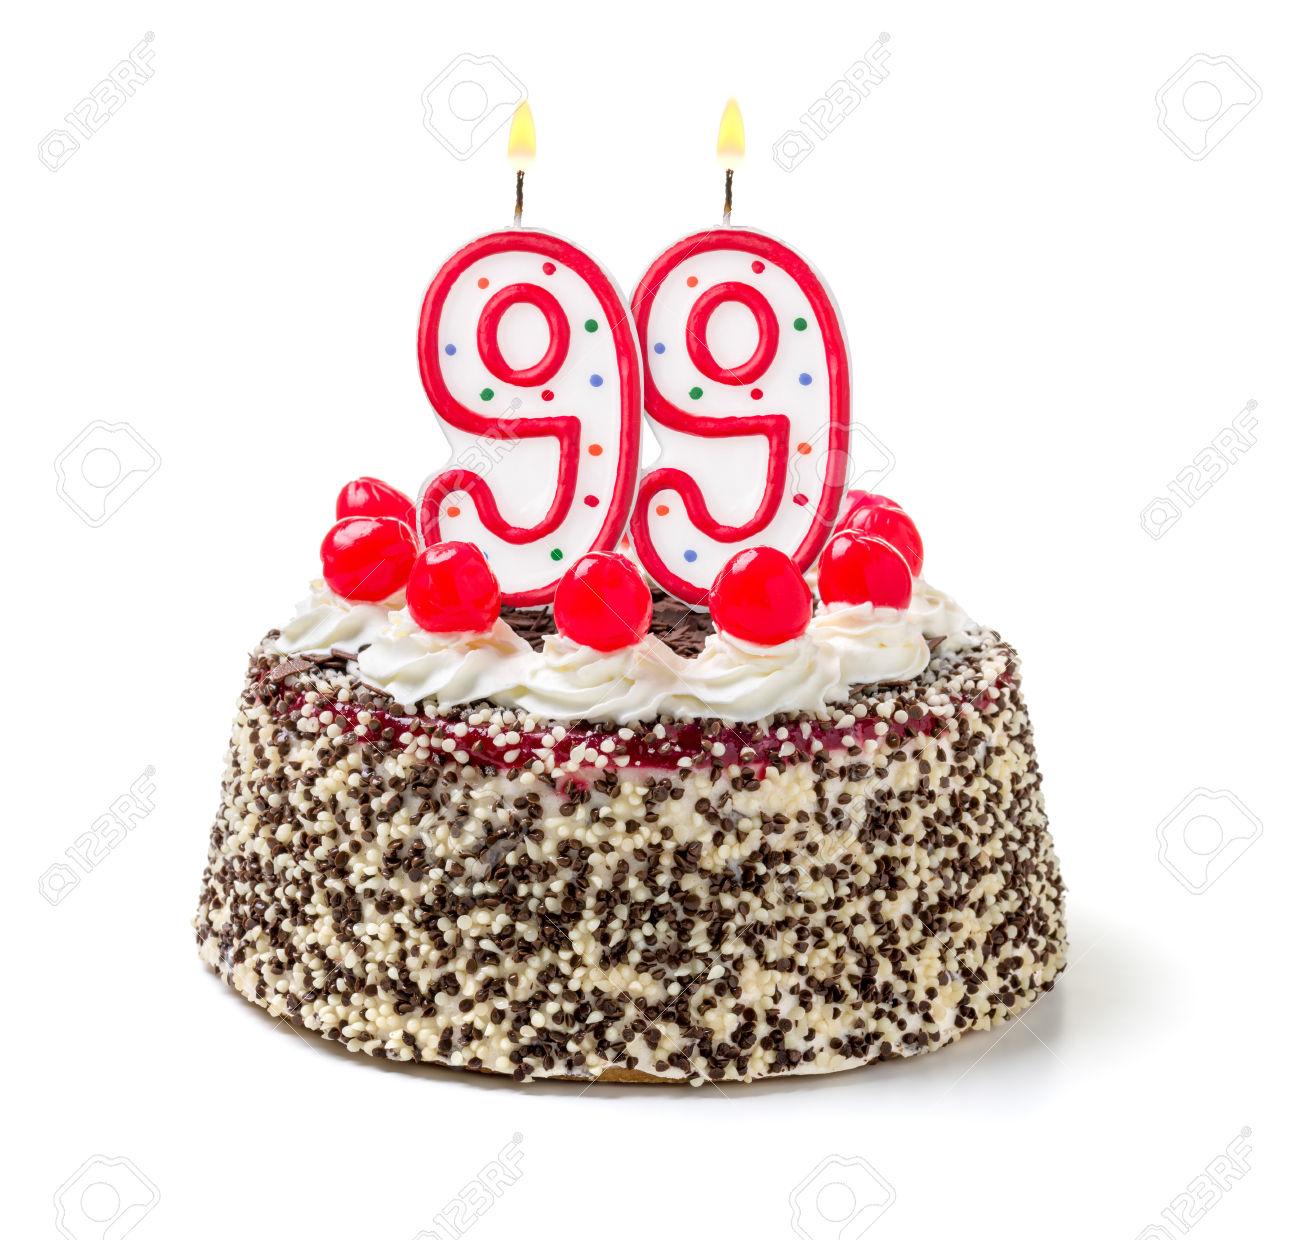 Burning Candles Birthday Cake